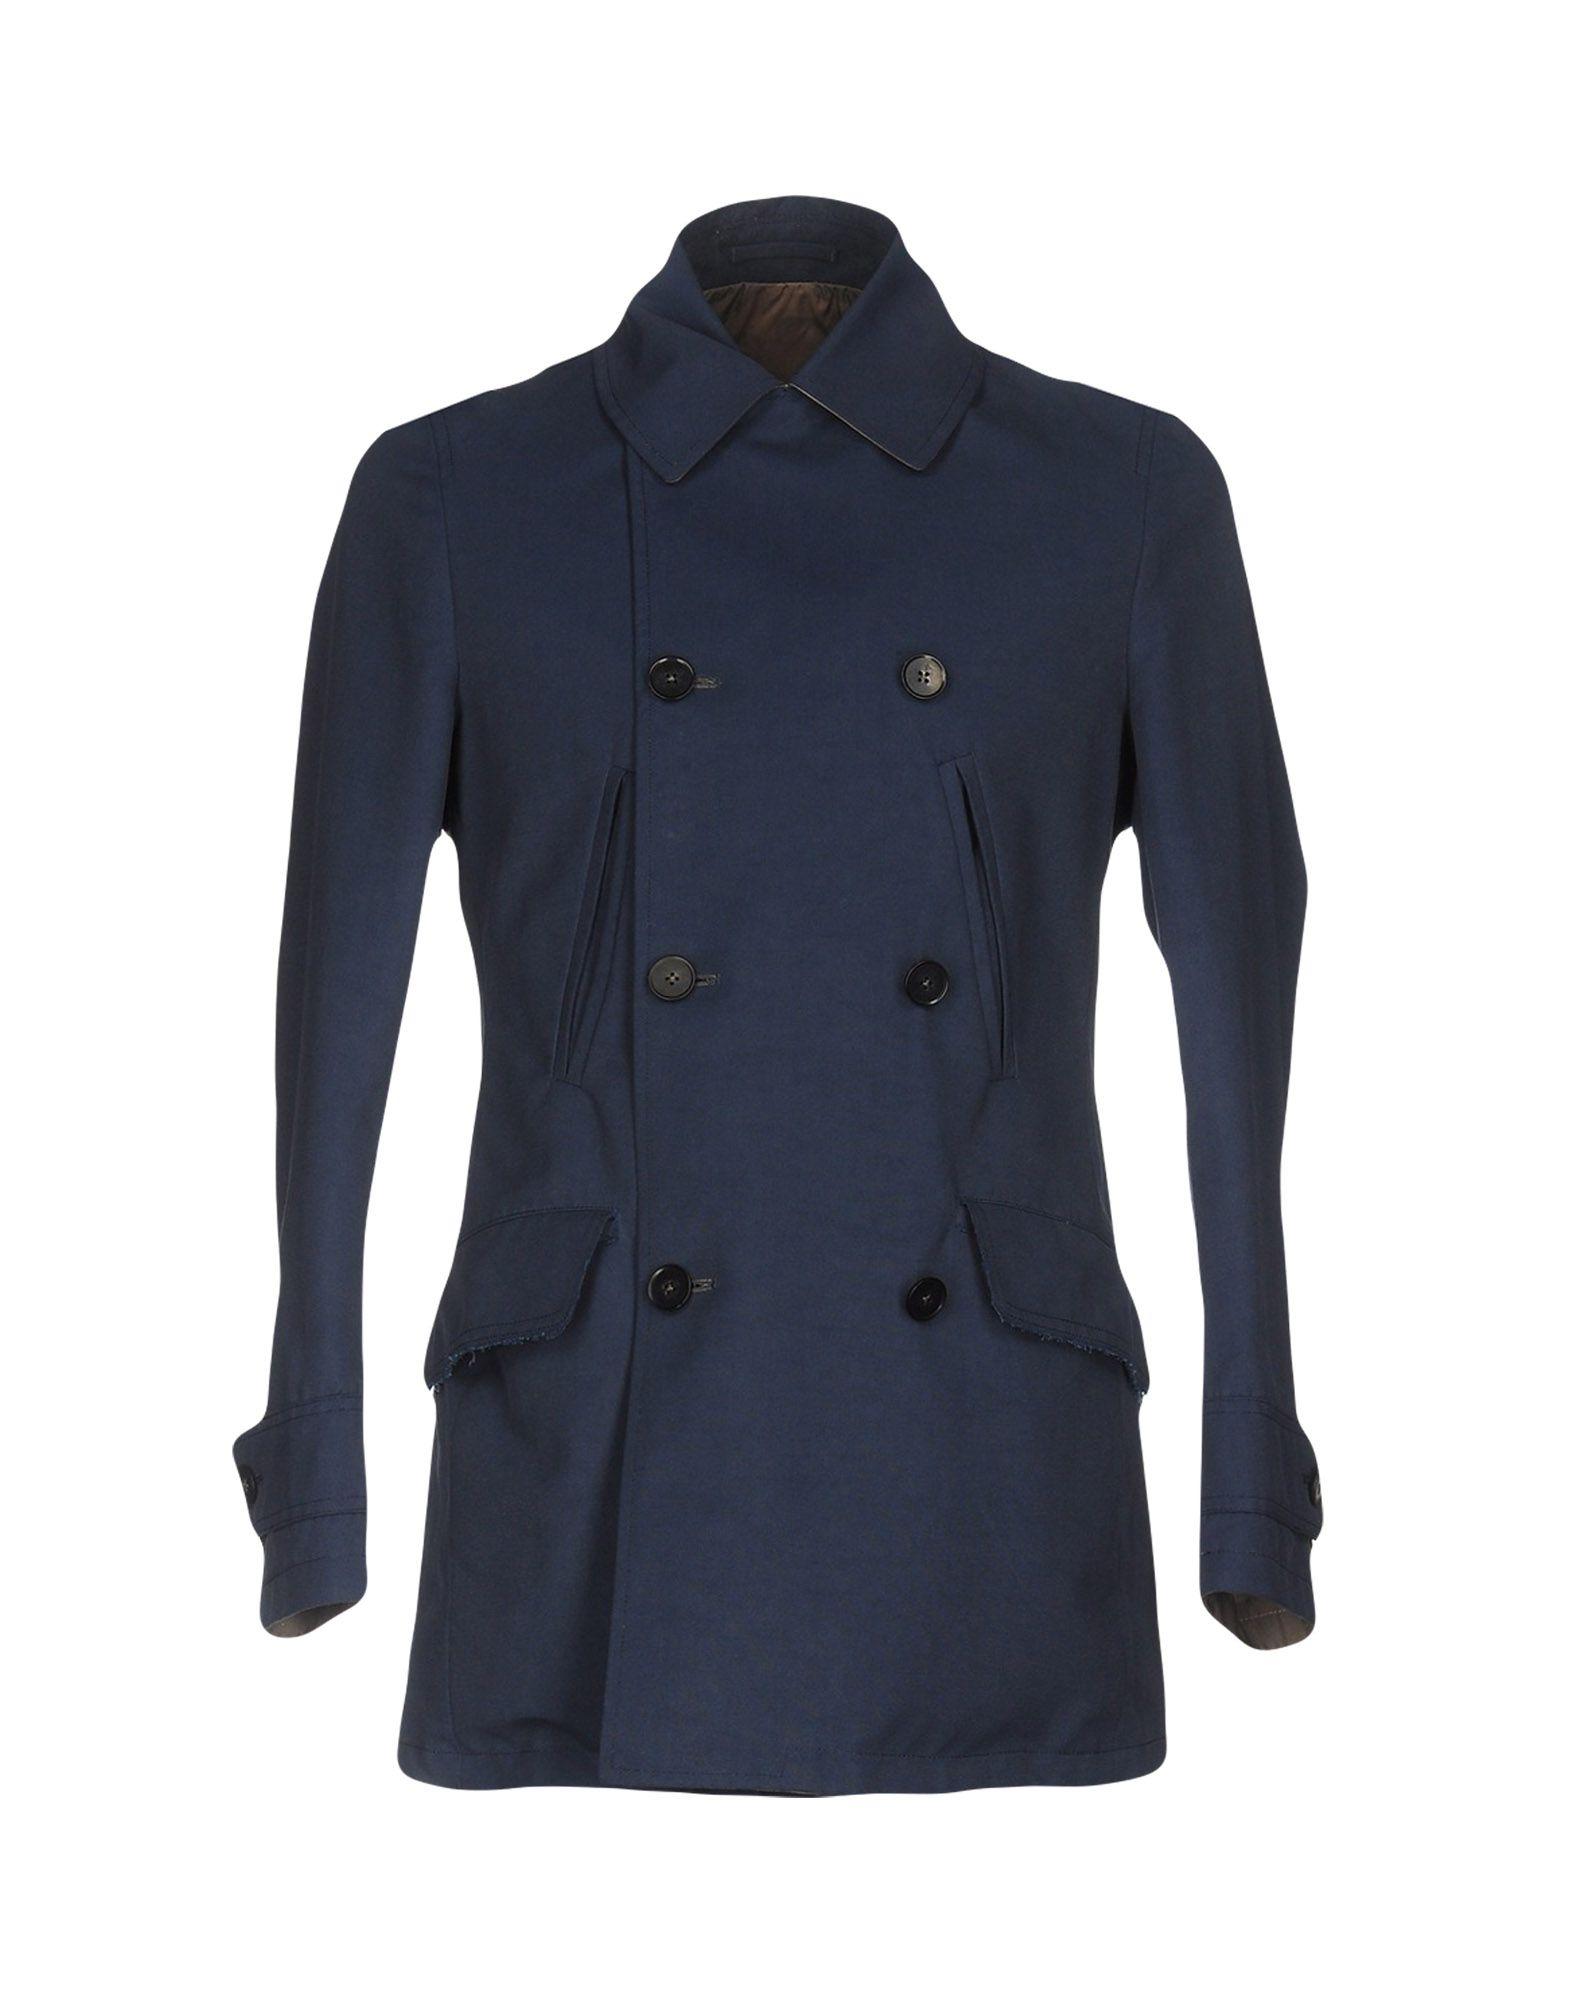 RVR LARDINI Double Breasted Pea Coat in Dark Blue